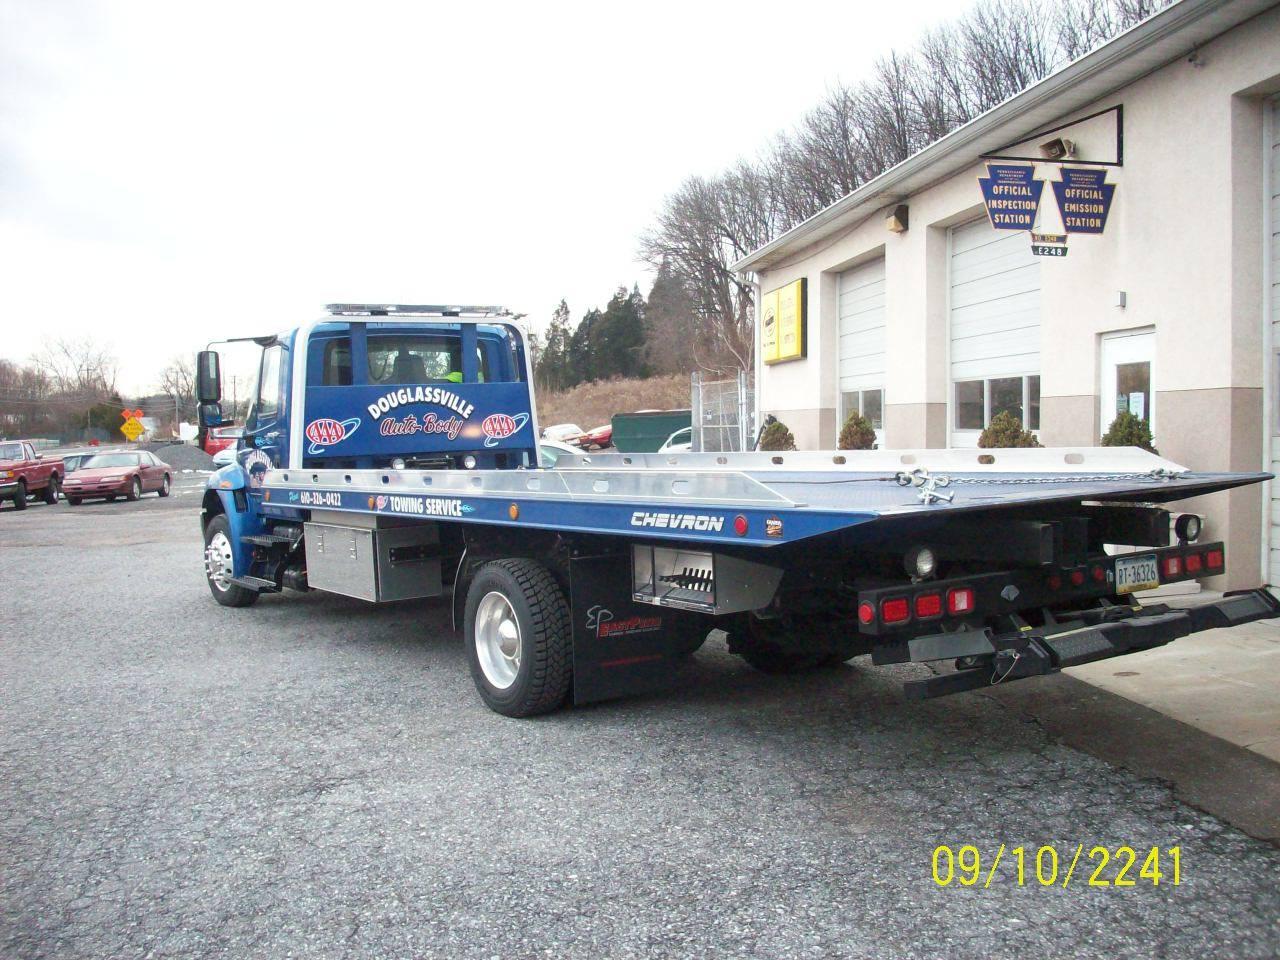 2008 International, Chevron S-10 Steel Bed